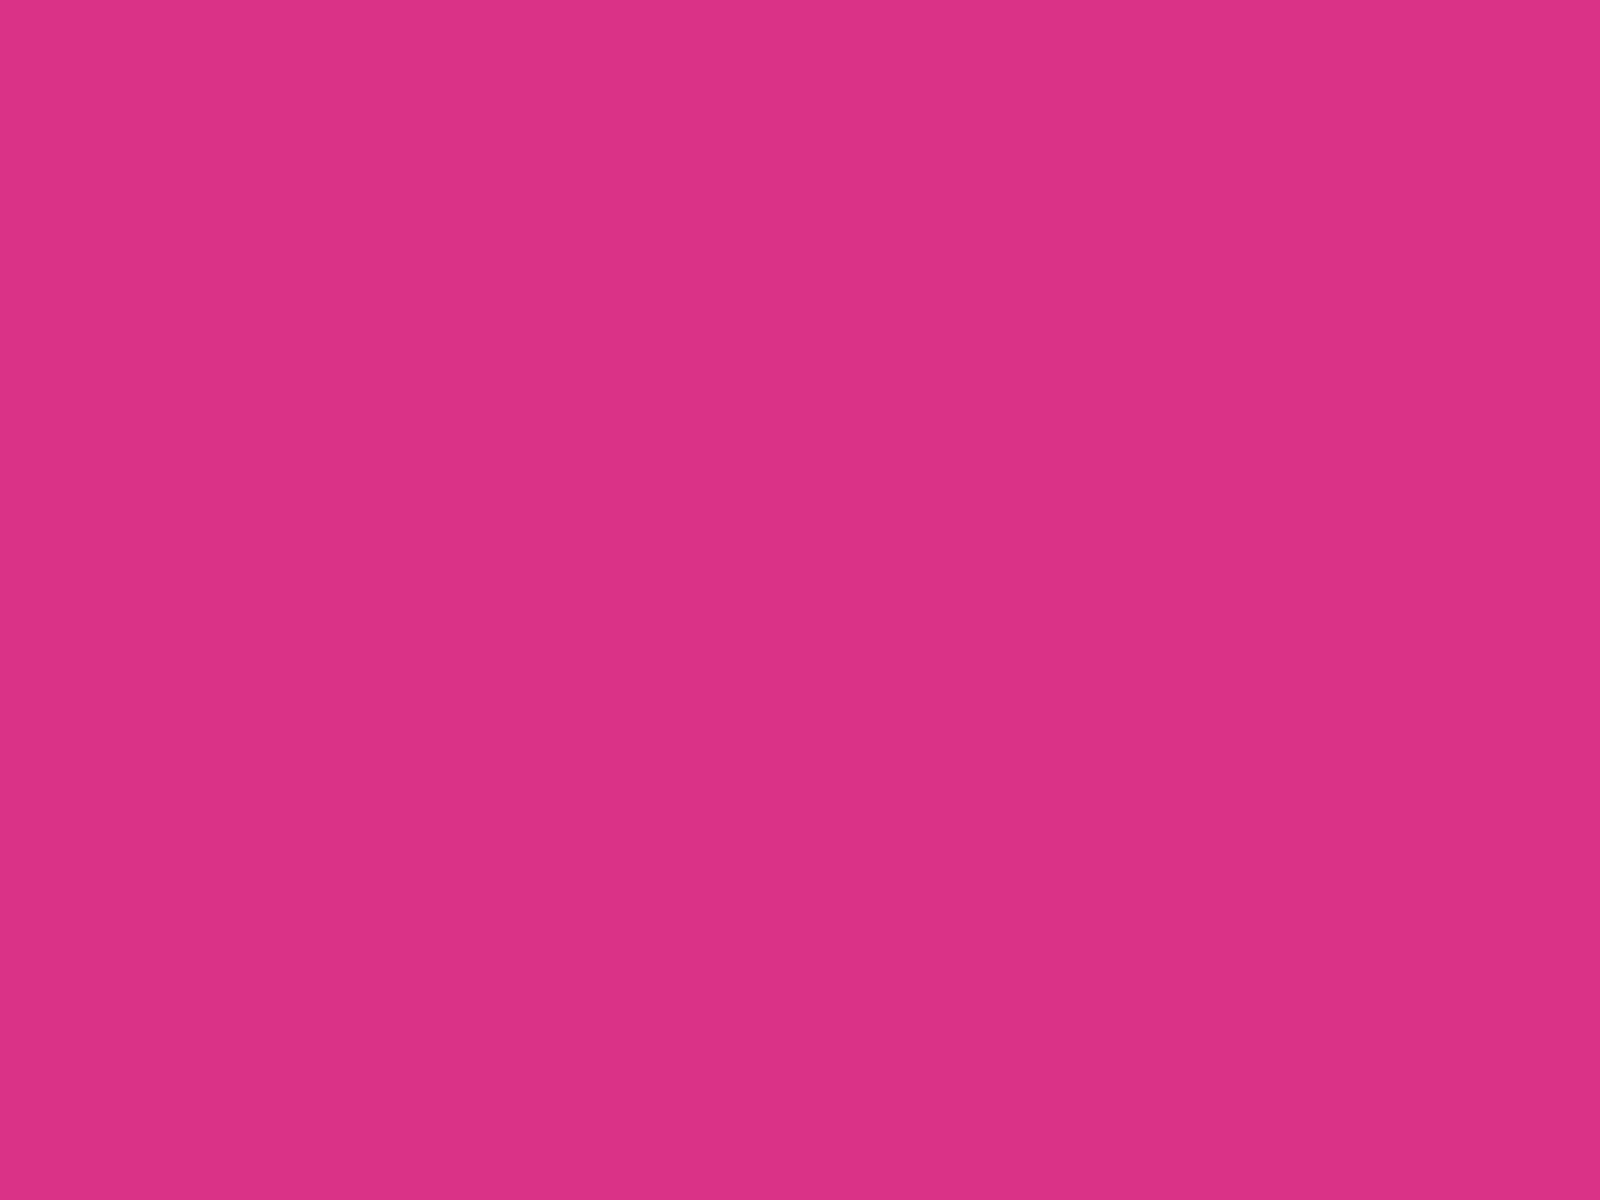 1600x1200 Deep Cerise Solid Color Background